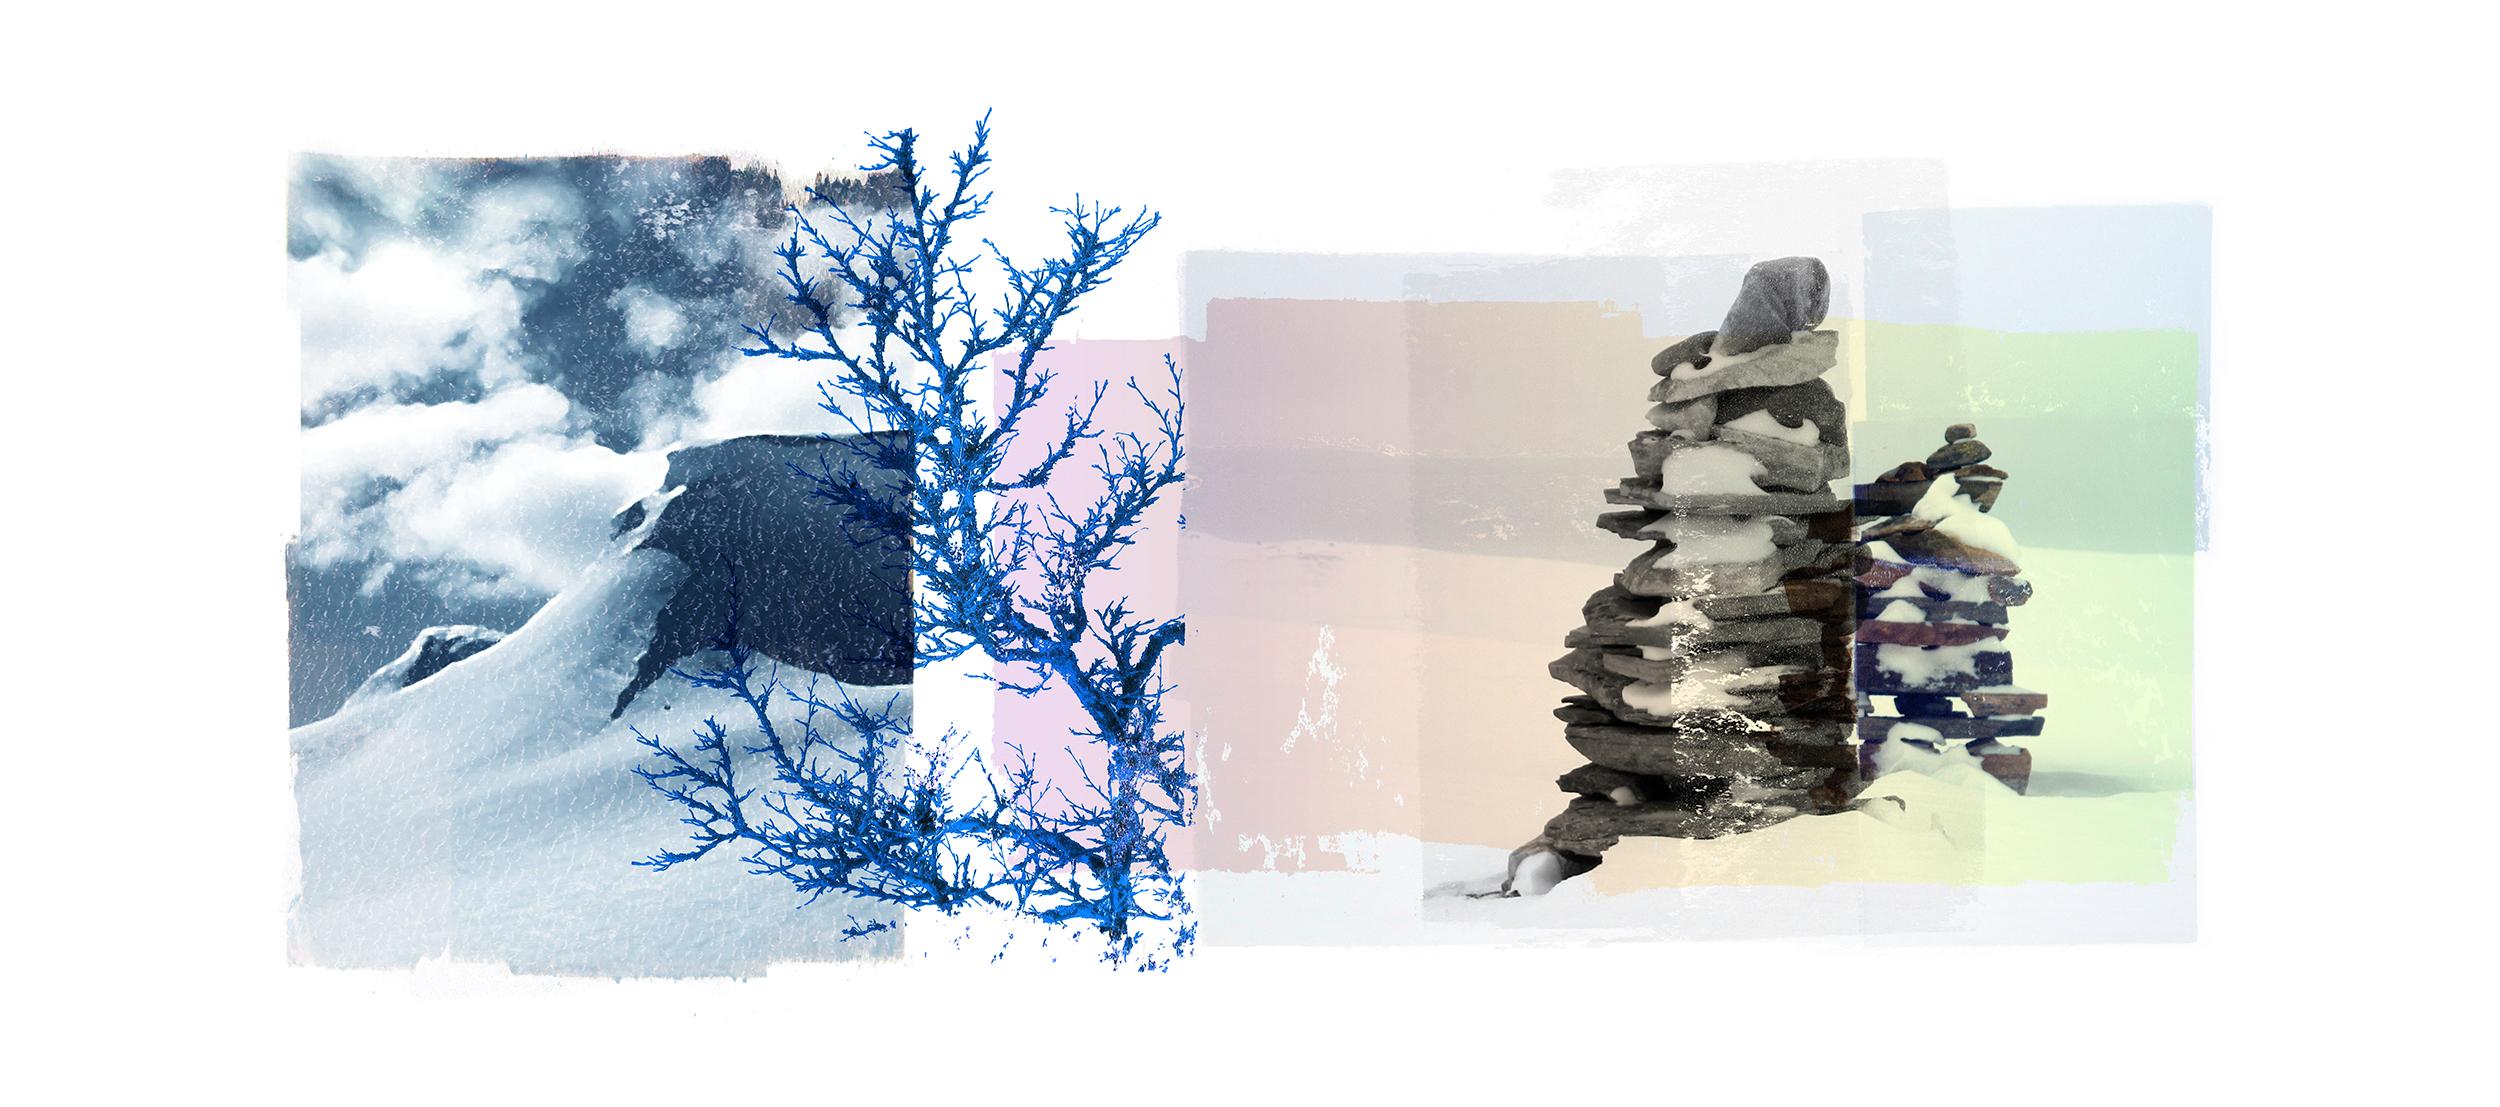 Reservoir / Blue Birch / Varde (Setesdal)  Original Archival UV Pigment Print / BFK Rives 250 gr 56 x 25 cm / 22 x 09 in Edition of 50 + 7 Ap Editeur: Per Fronth Studios / Printer Henrik Aunevik  21/2016: